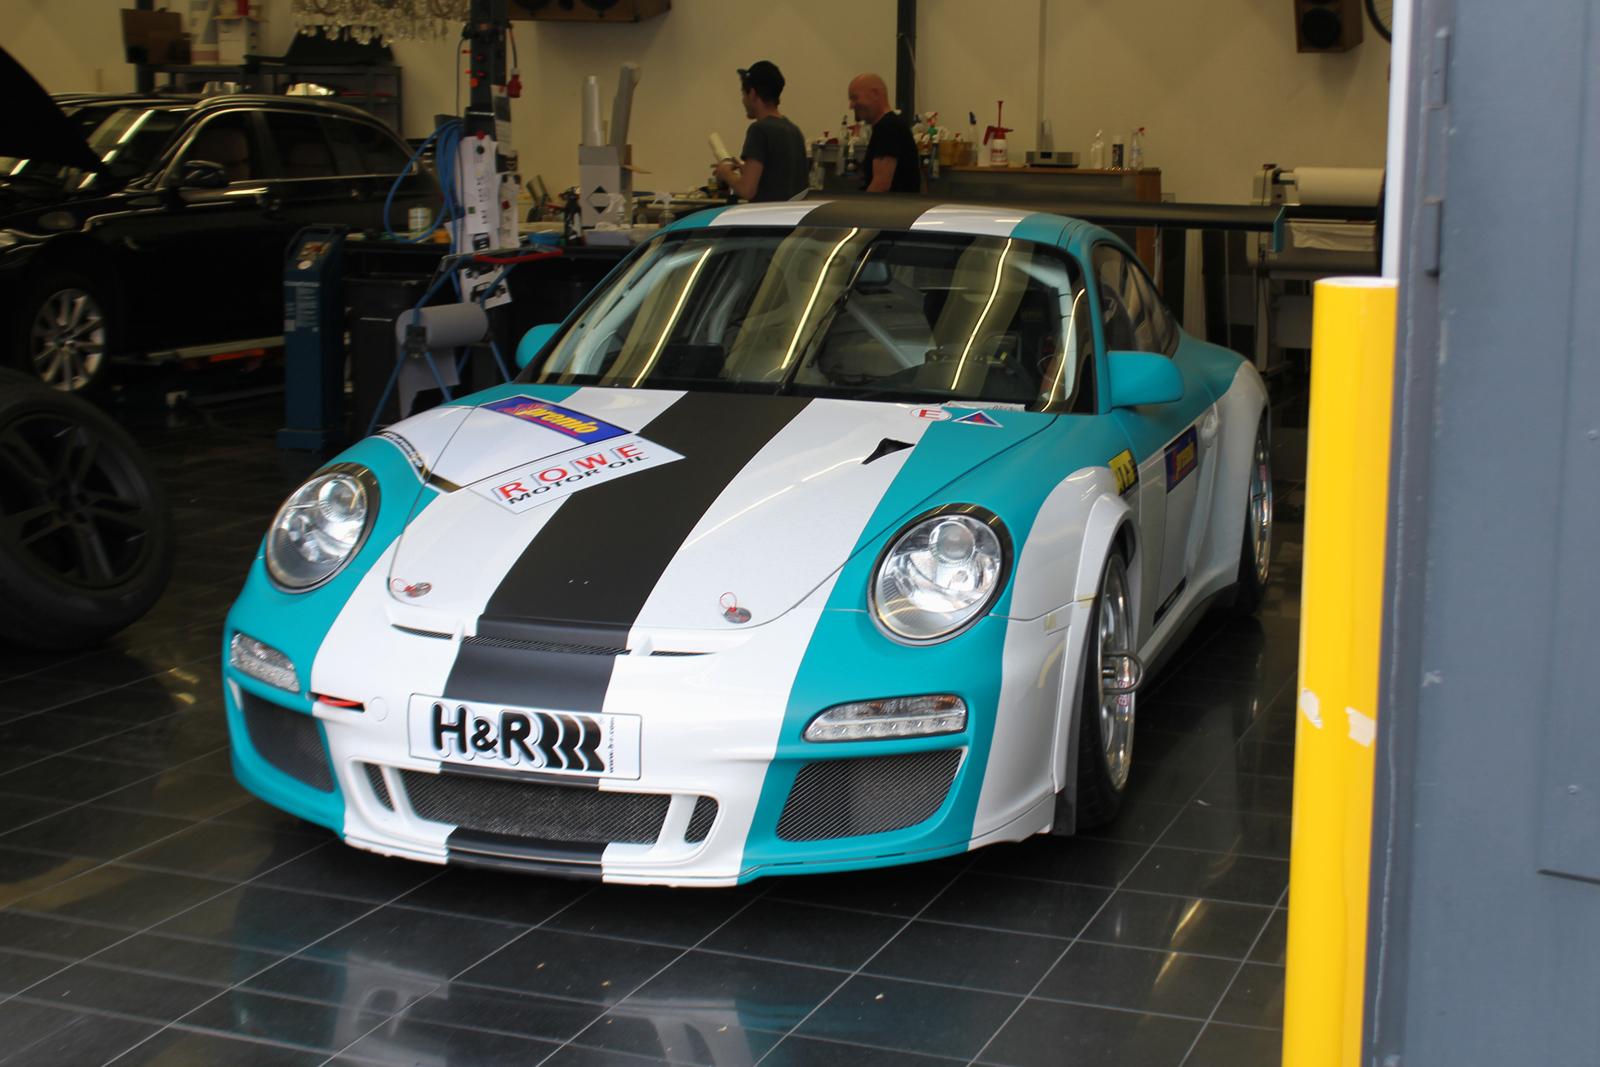 Auto Folierung Car Wrapping Porsche GT3 CUP